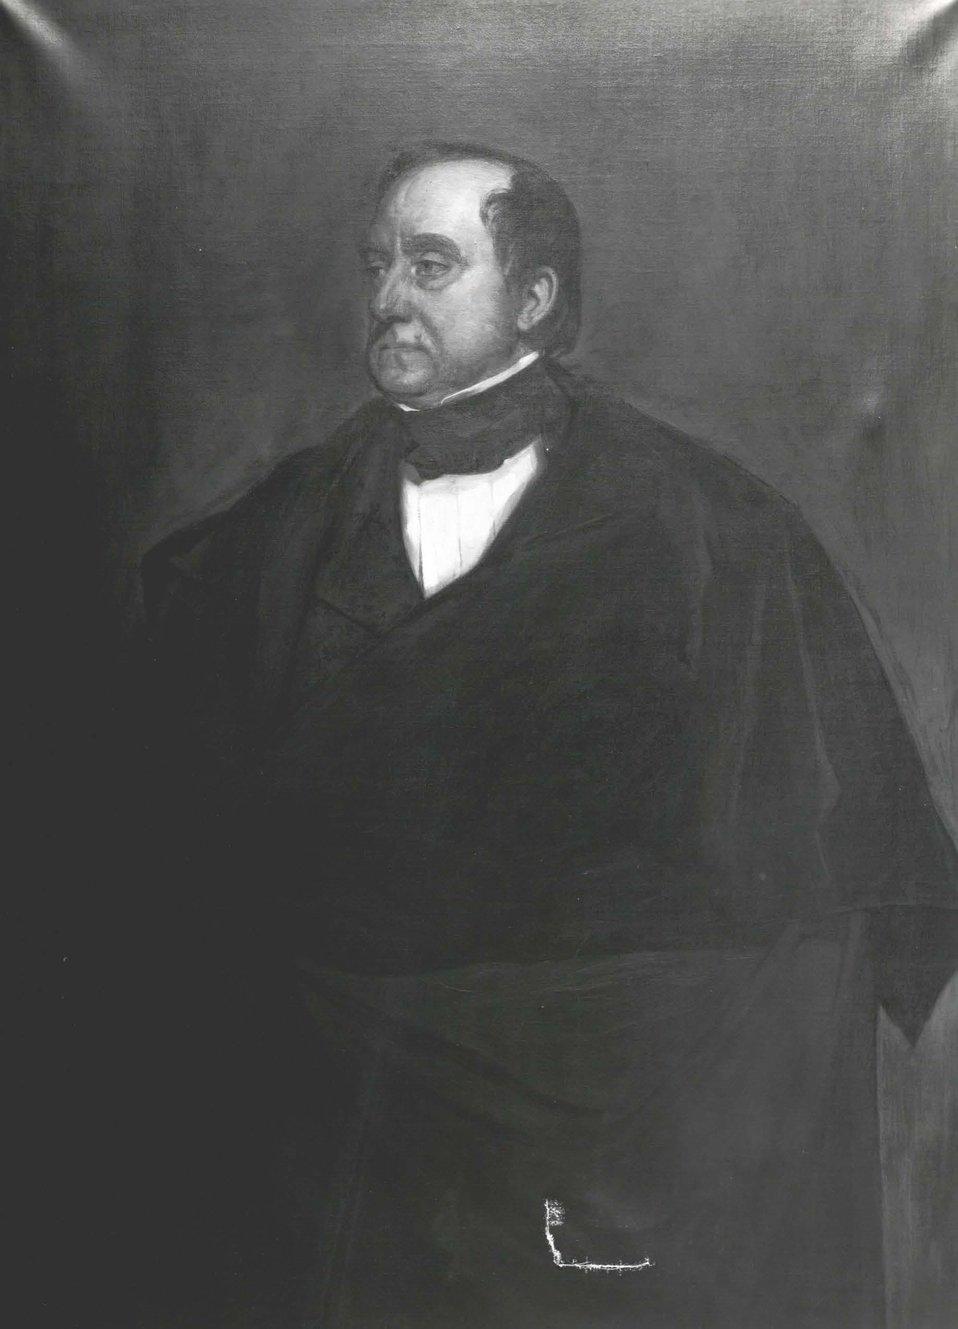 Lewis Cass, U.S. Secretary of State